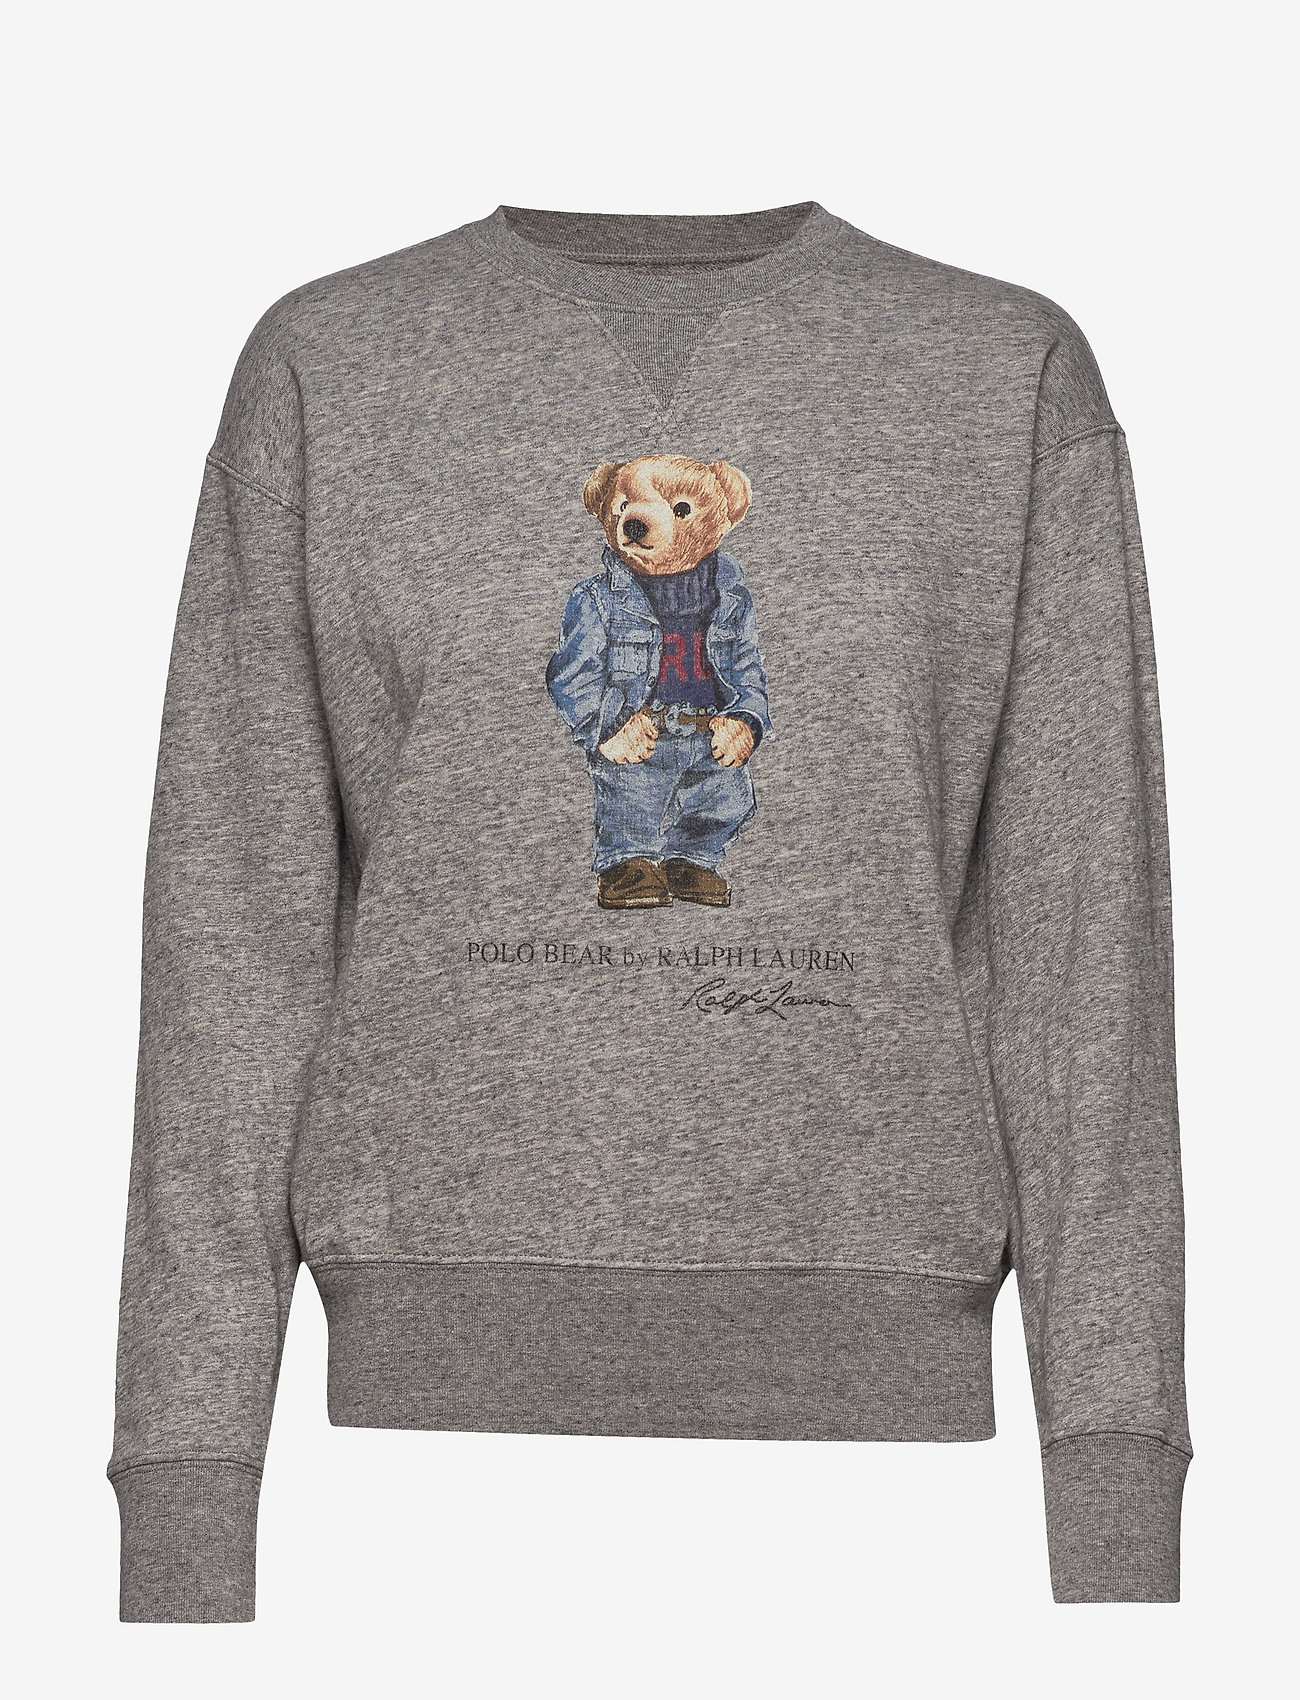 Polo Ralph Lauren - Polo Bear Fleece Sweatshirt - sweatshirts - dark vintage heat - 0